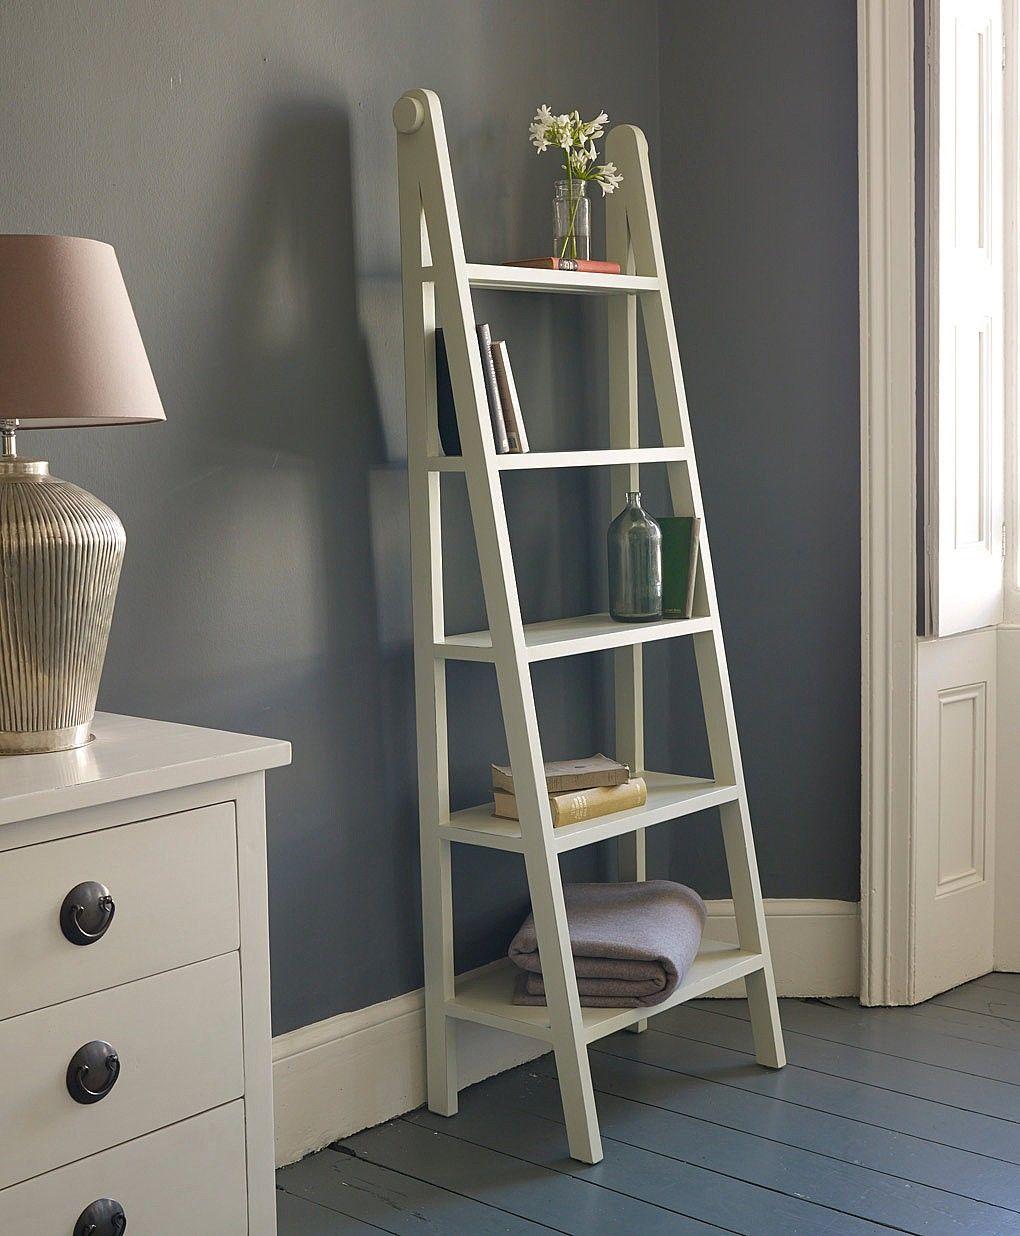 5 Ways To Build Your Own Bookshelf Small Space Hacks White